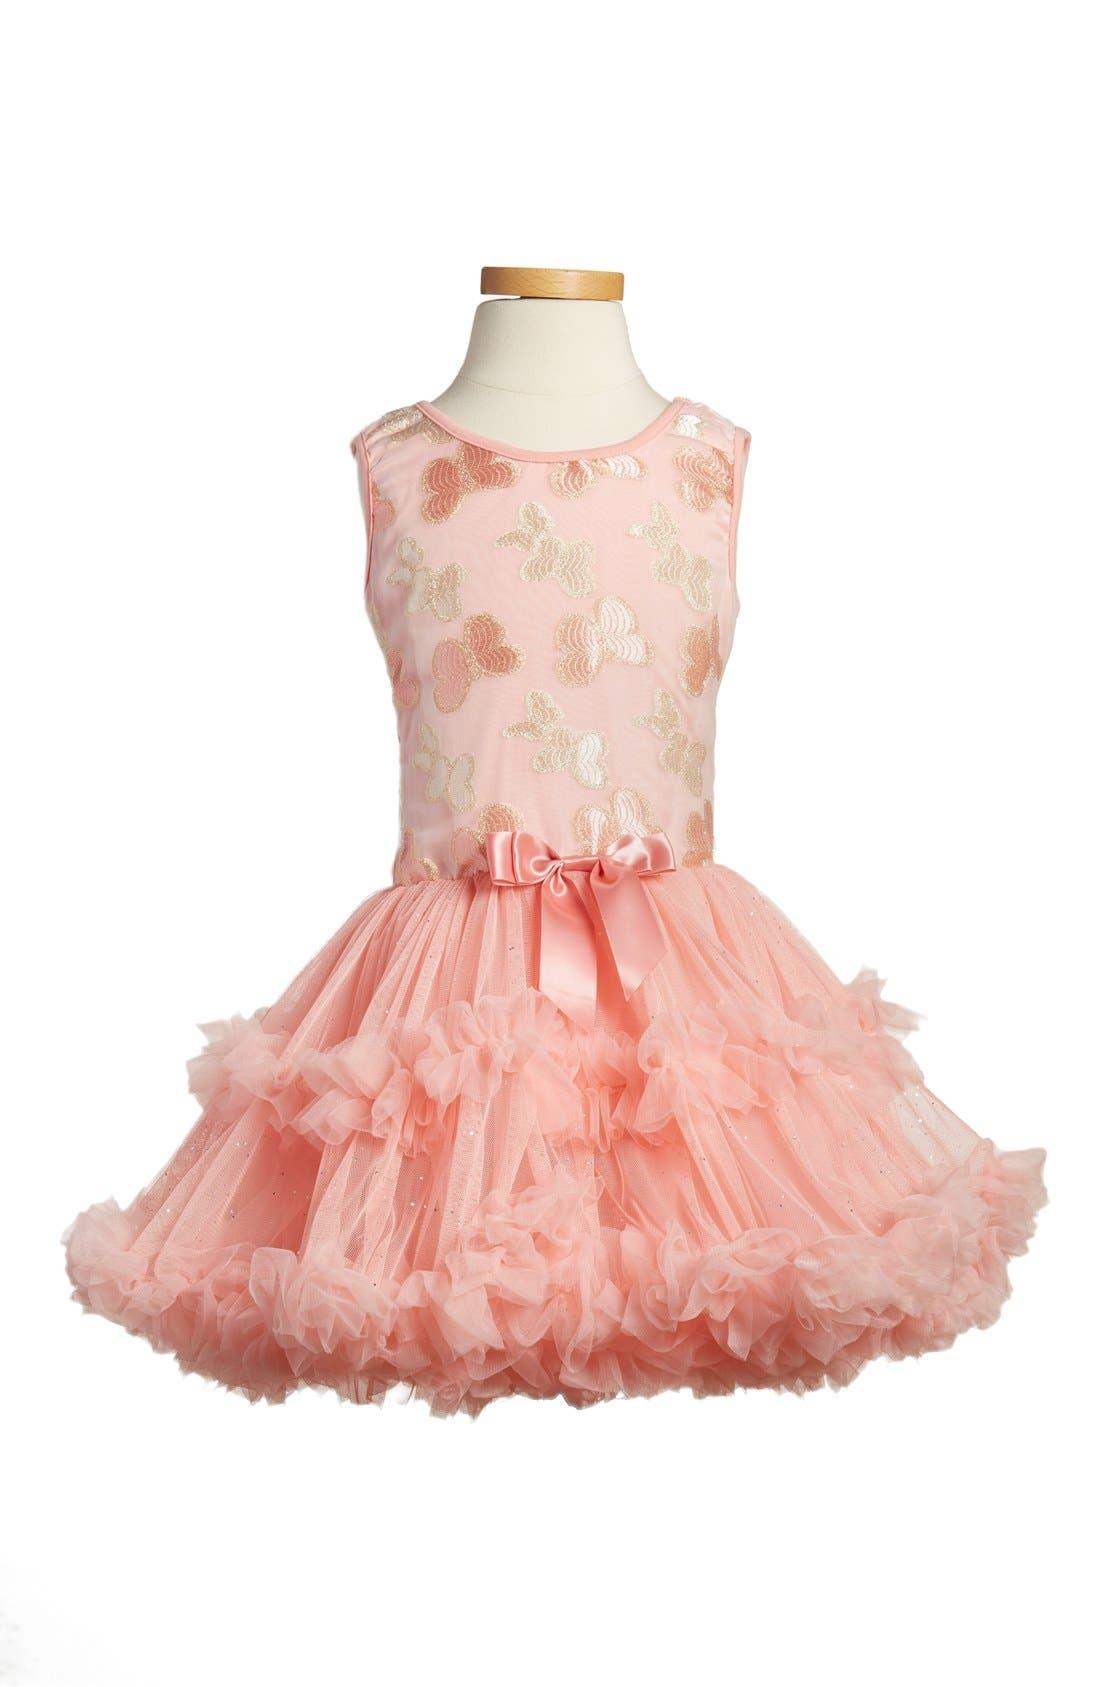 POPATU 'Butterfly' Sleeveless Party Dress, Main, color, PEACH